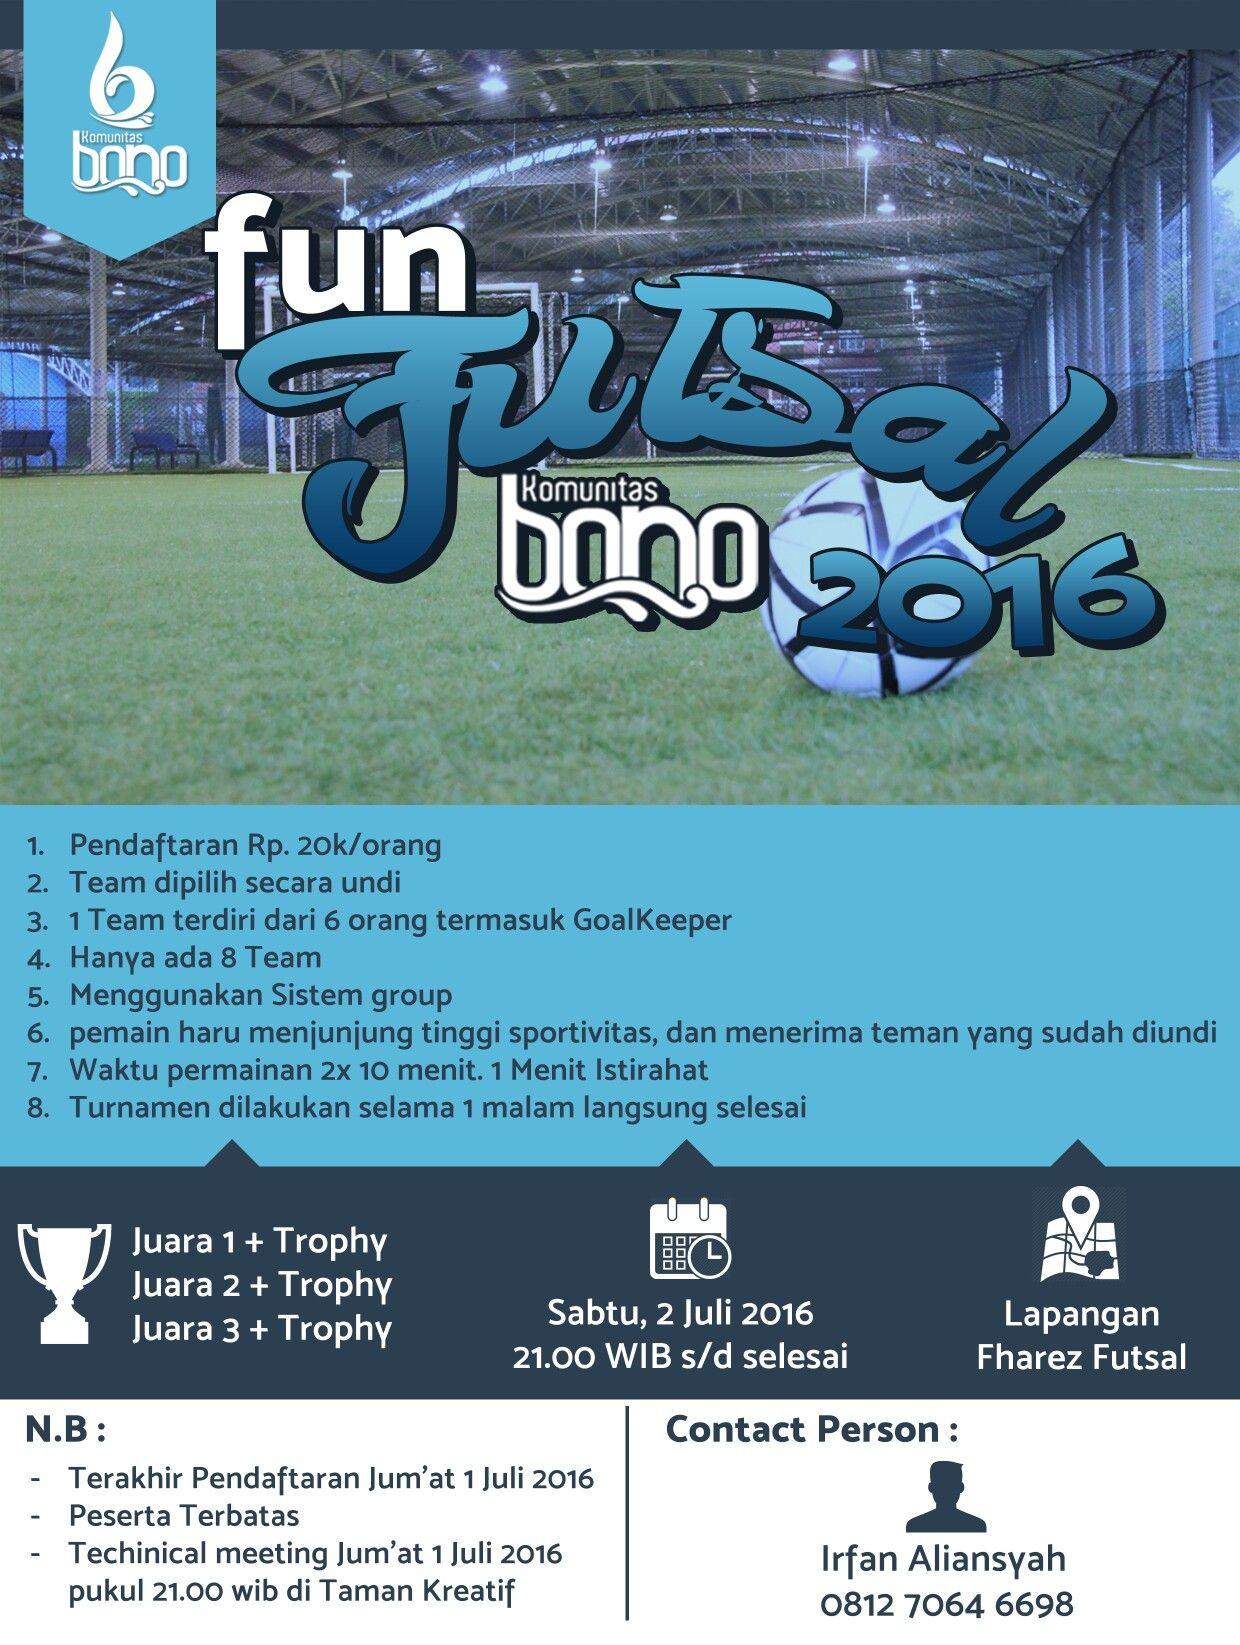 Design Flyer Turnamen Futsal 2016 Design Graphic Pinterest